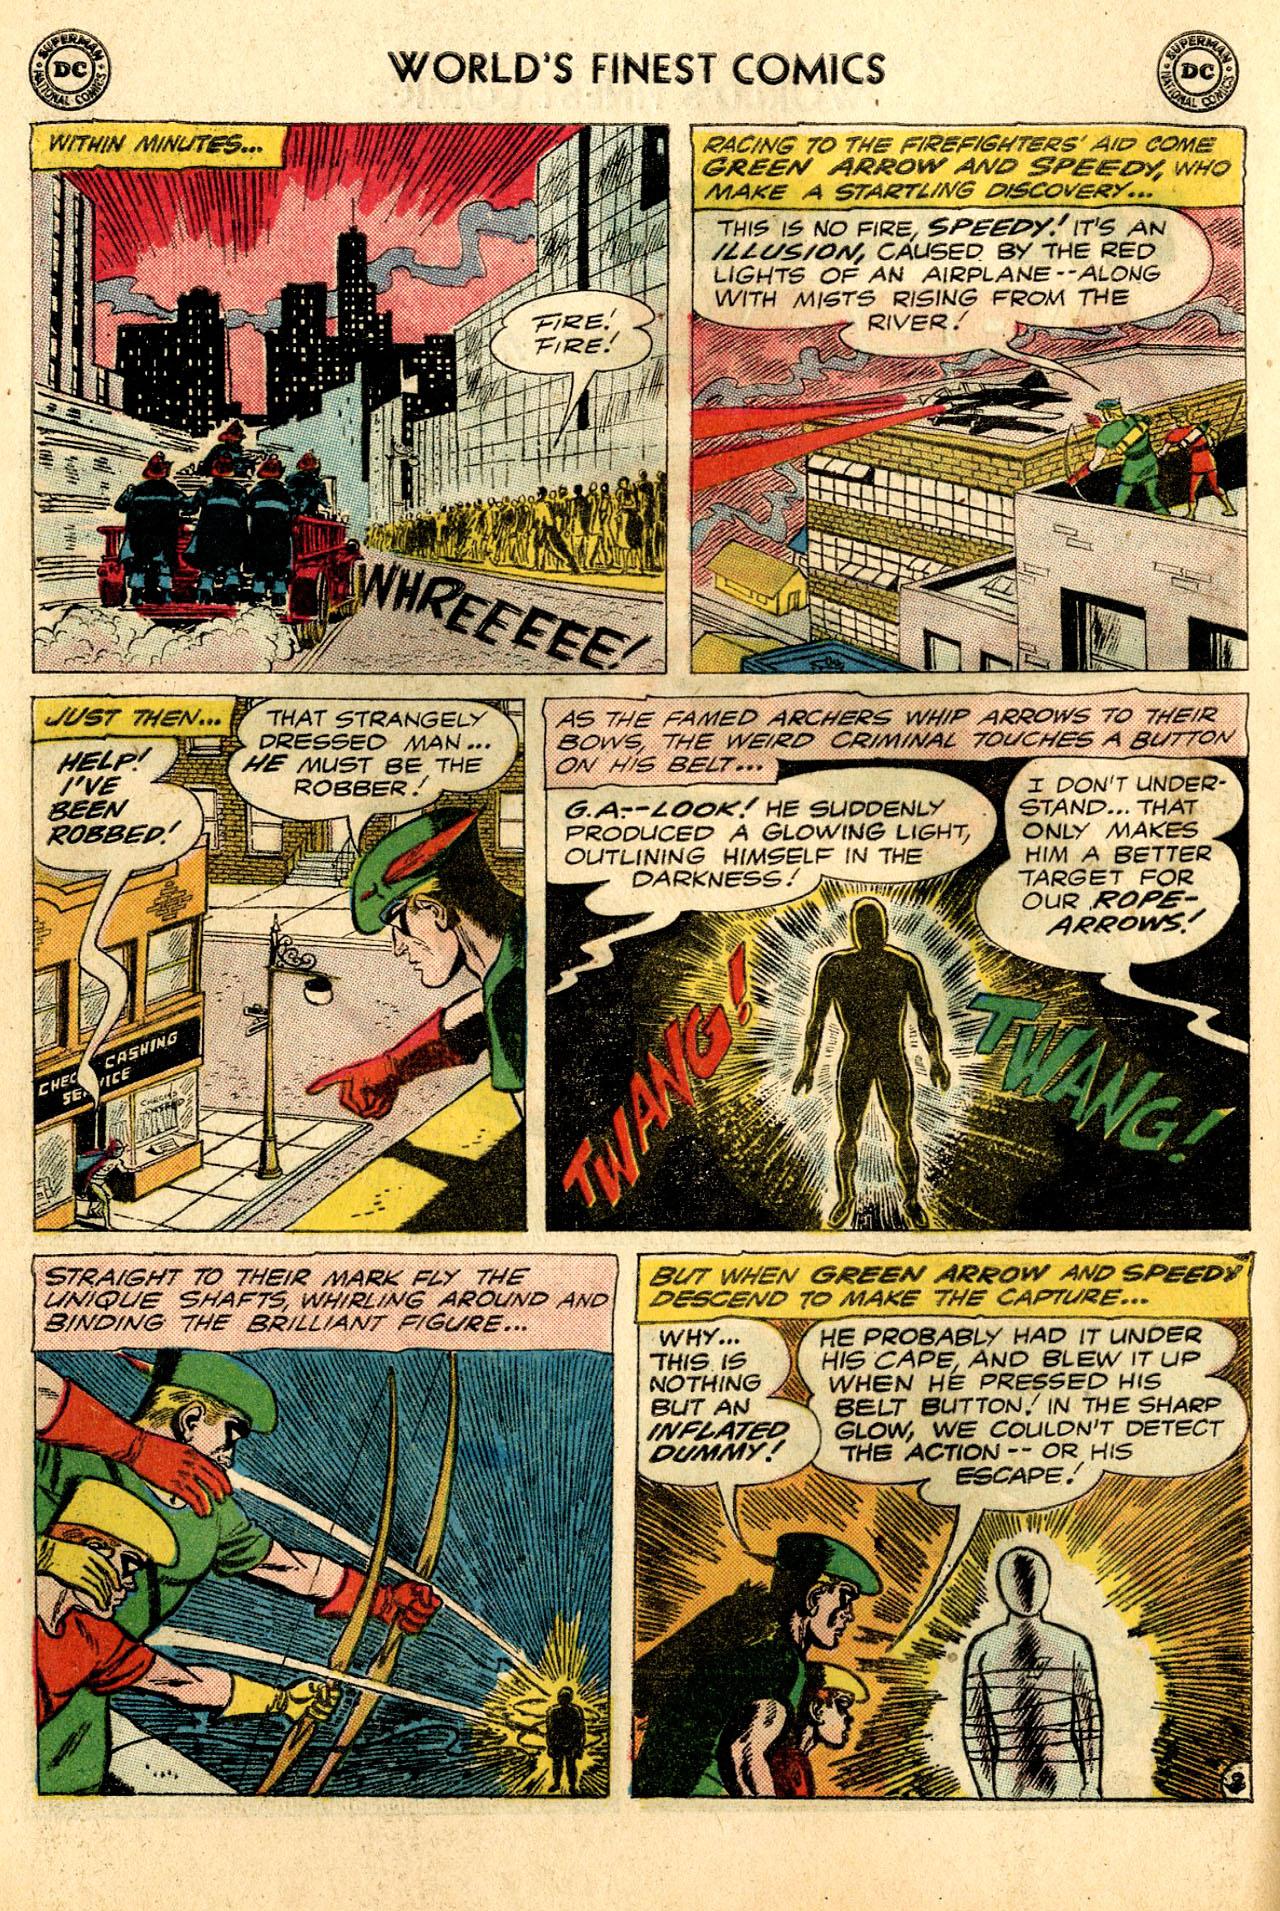 Read online World's Finest Comics comic -  Issue #110 - 28